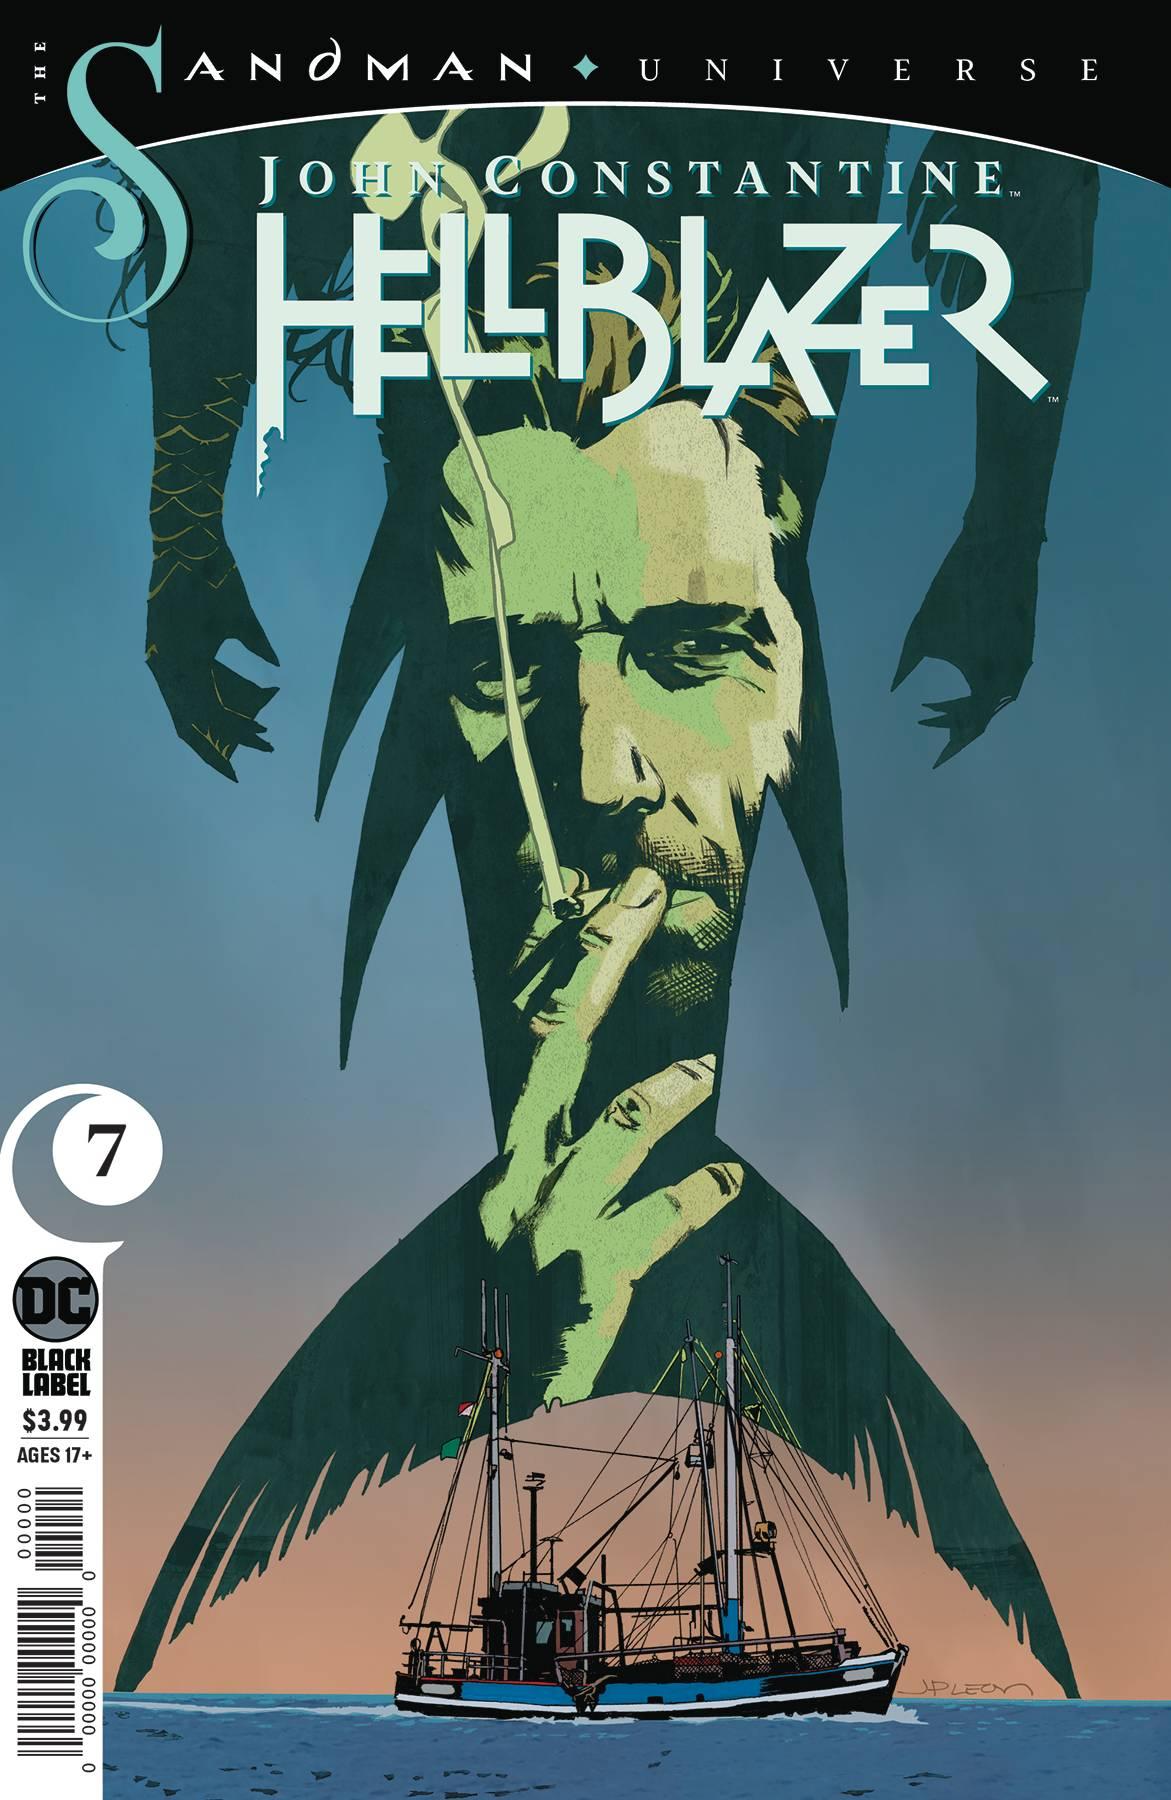 John Constantine Hellblazer #7 (2020)